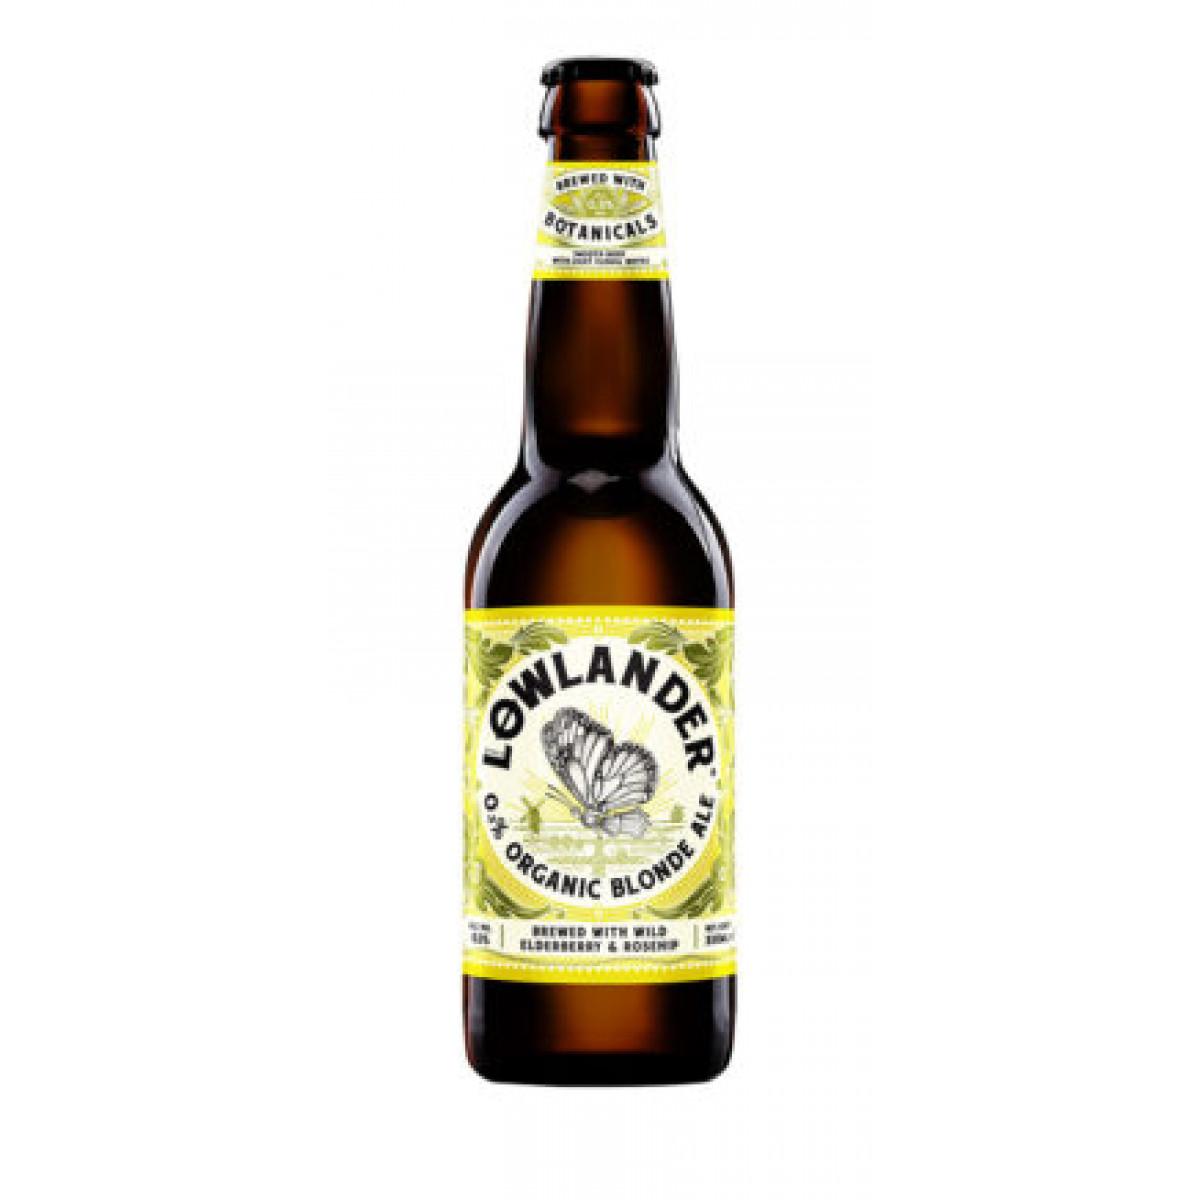 Organic Blonde Ale 0.3%